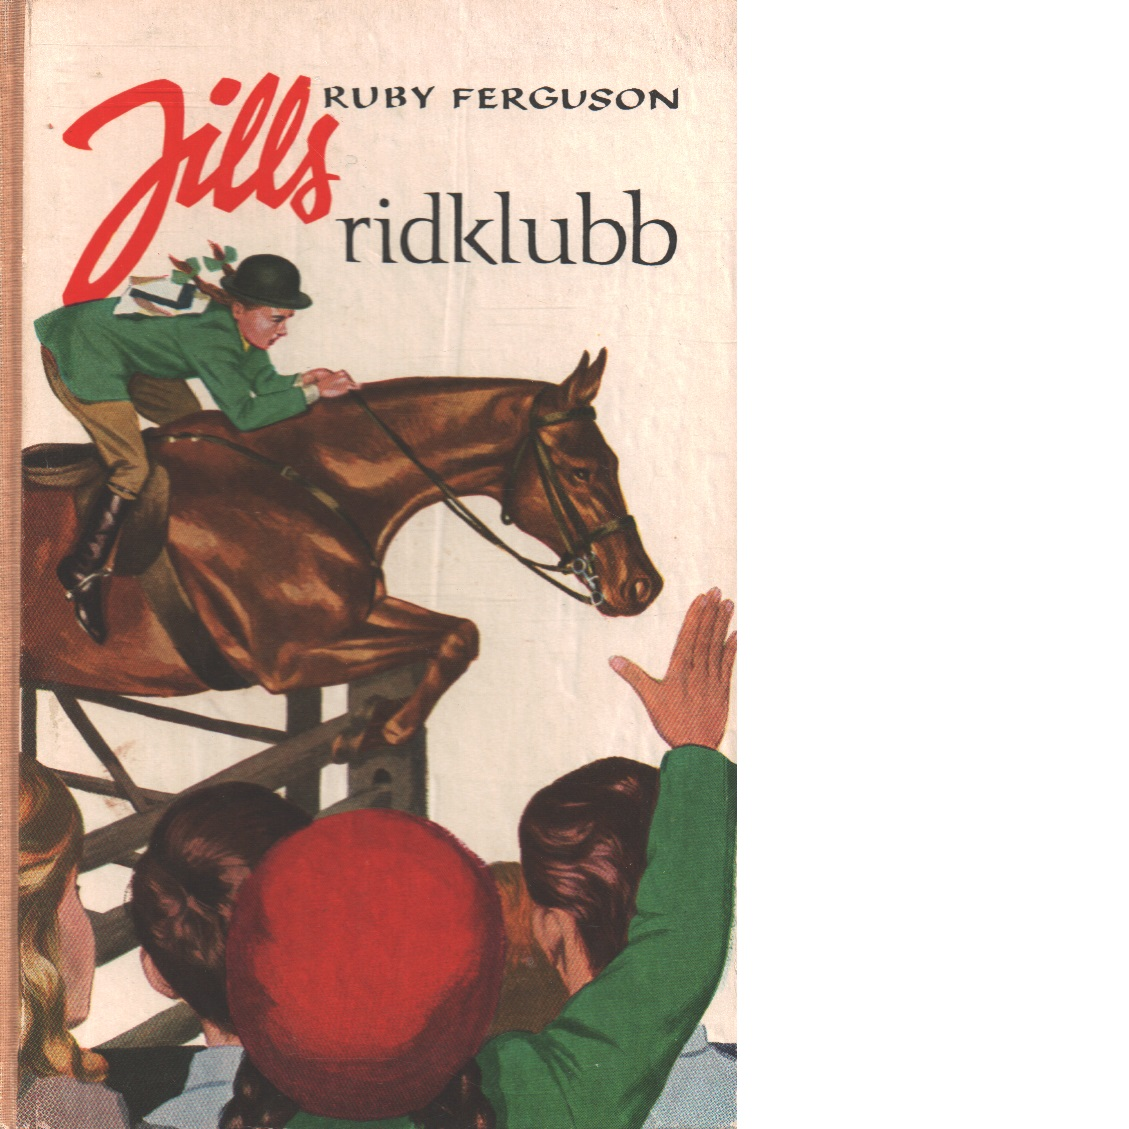 Jills ridklubb - Ferguson, Ruby